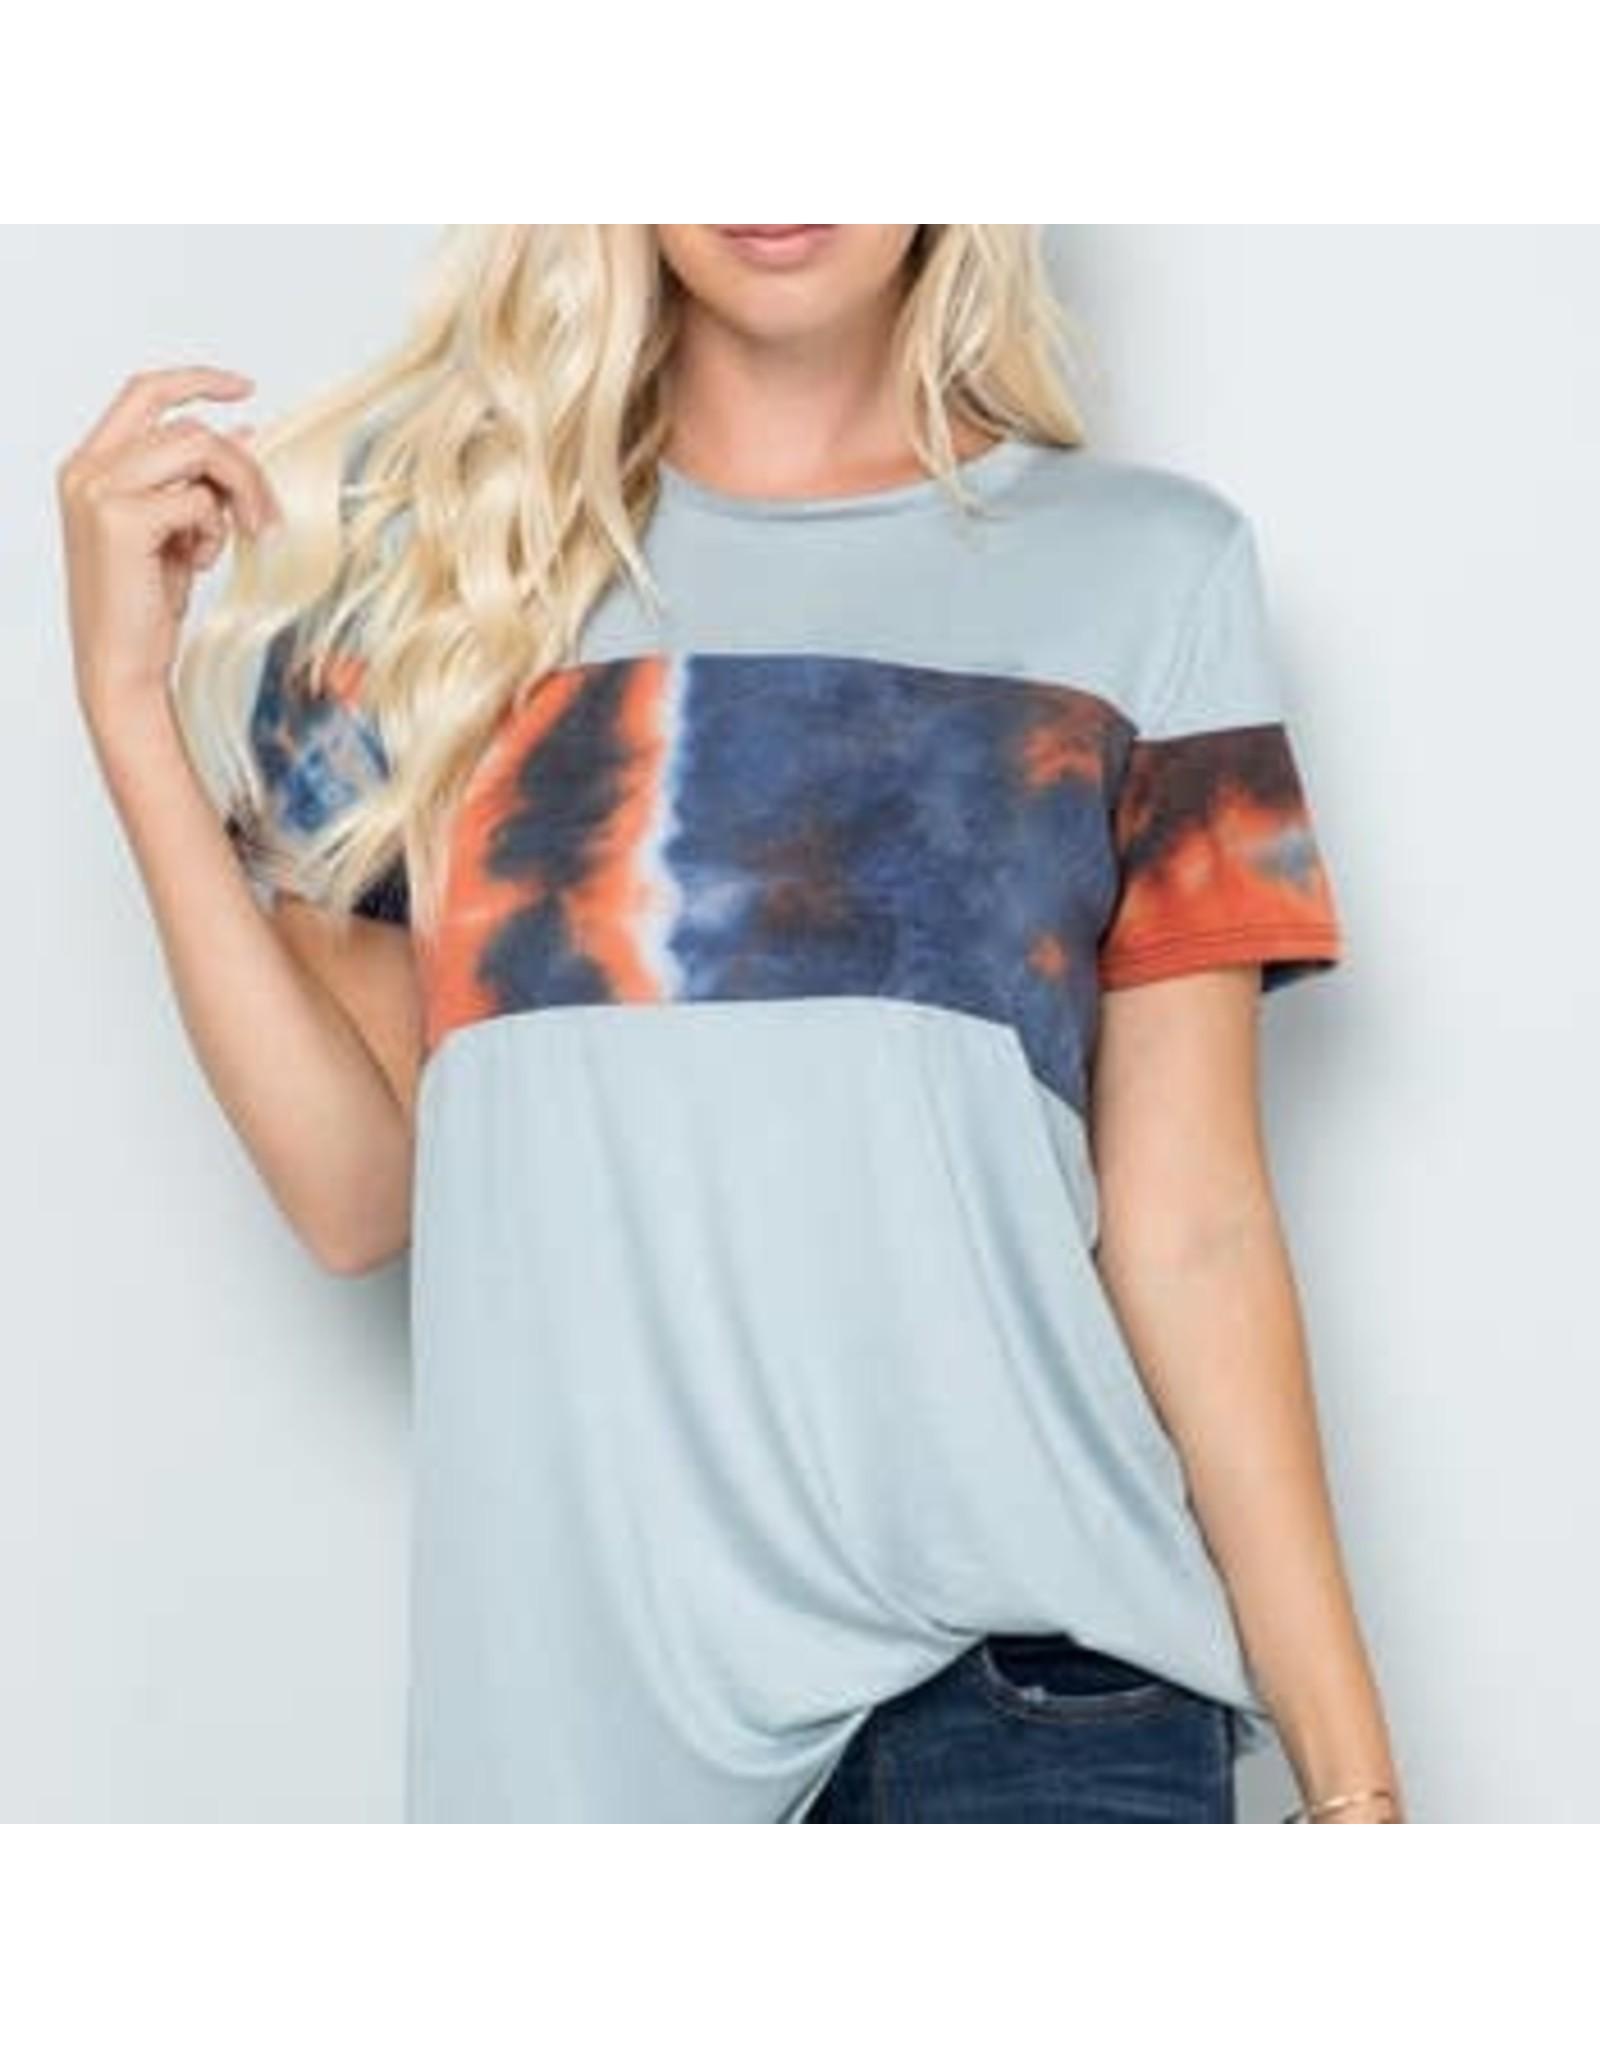 Celeste Clothing Celeste Sage Stripe